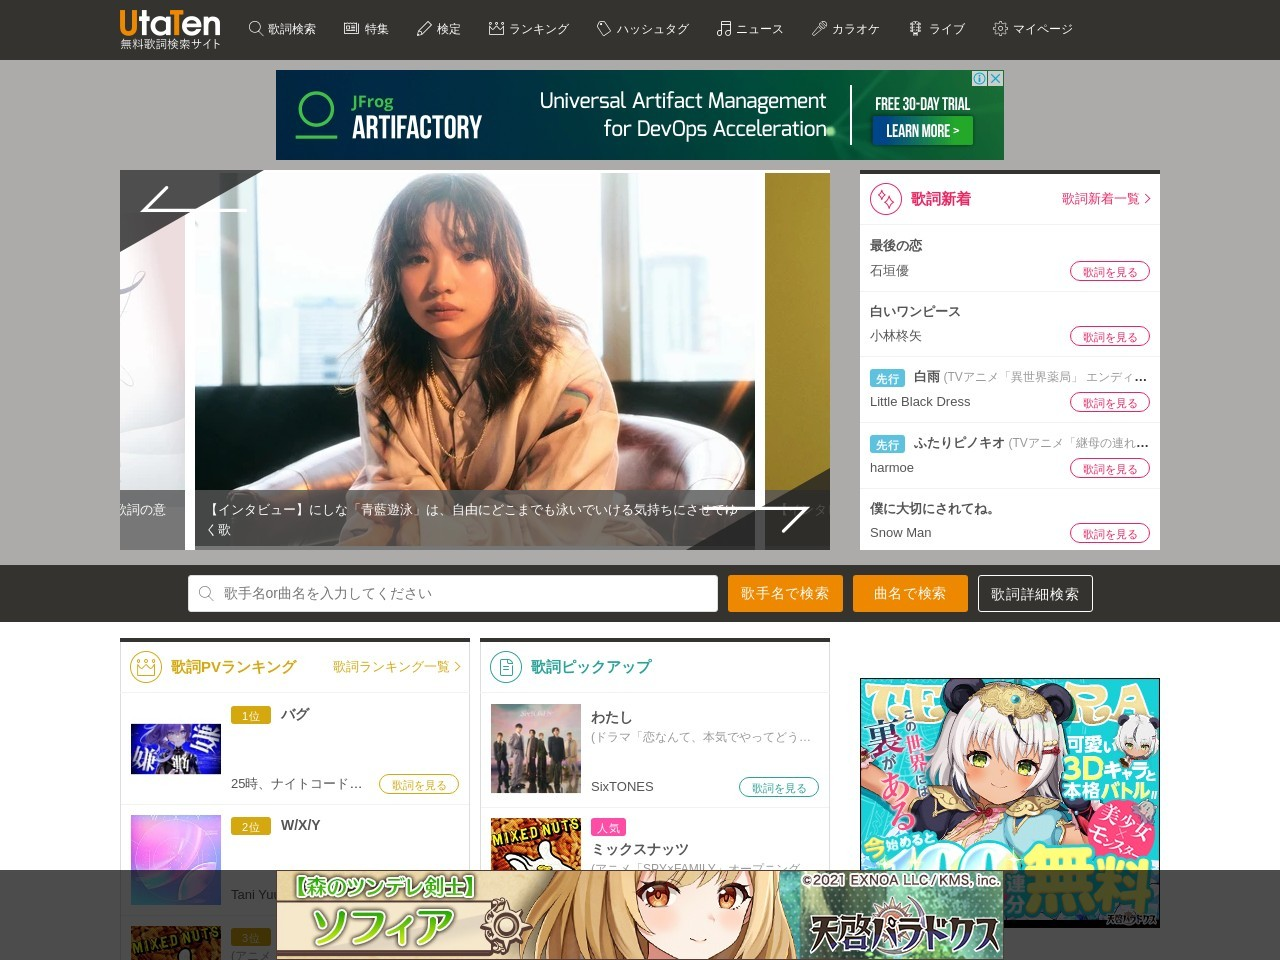 「Official髭男dism」の歌詞・動画・ニュース一覧|歌詞検索サイト【UtaTen】